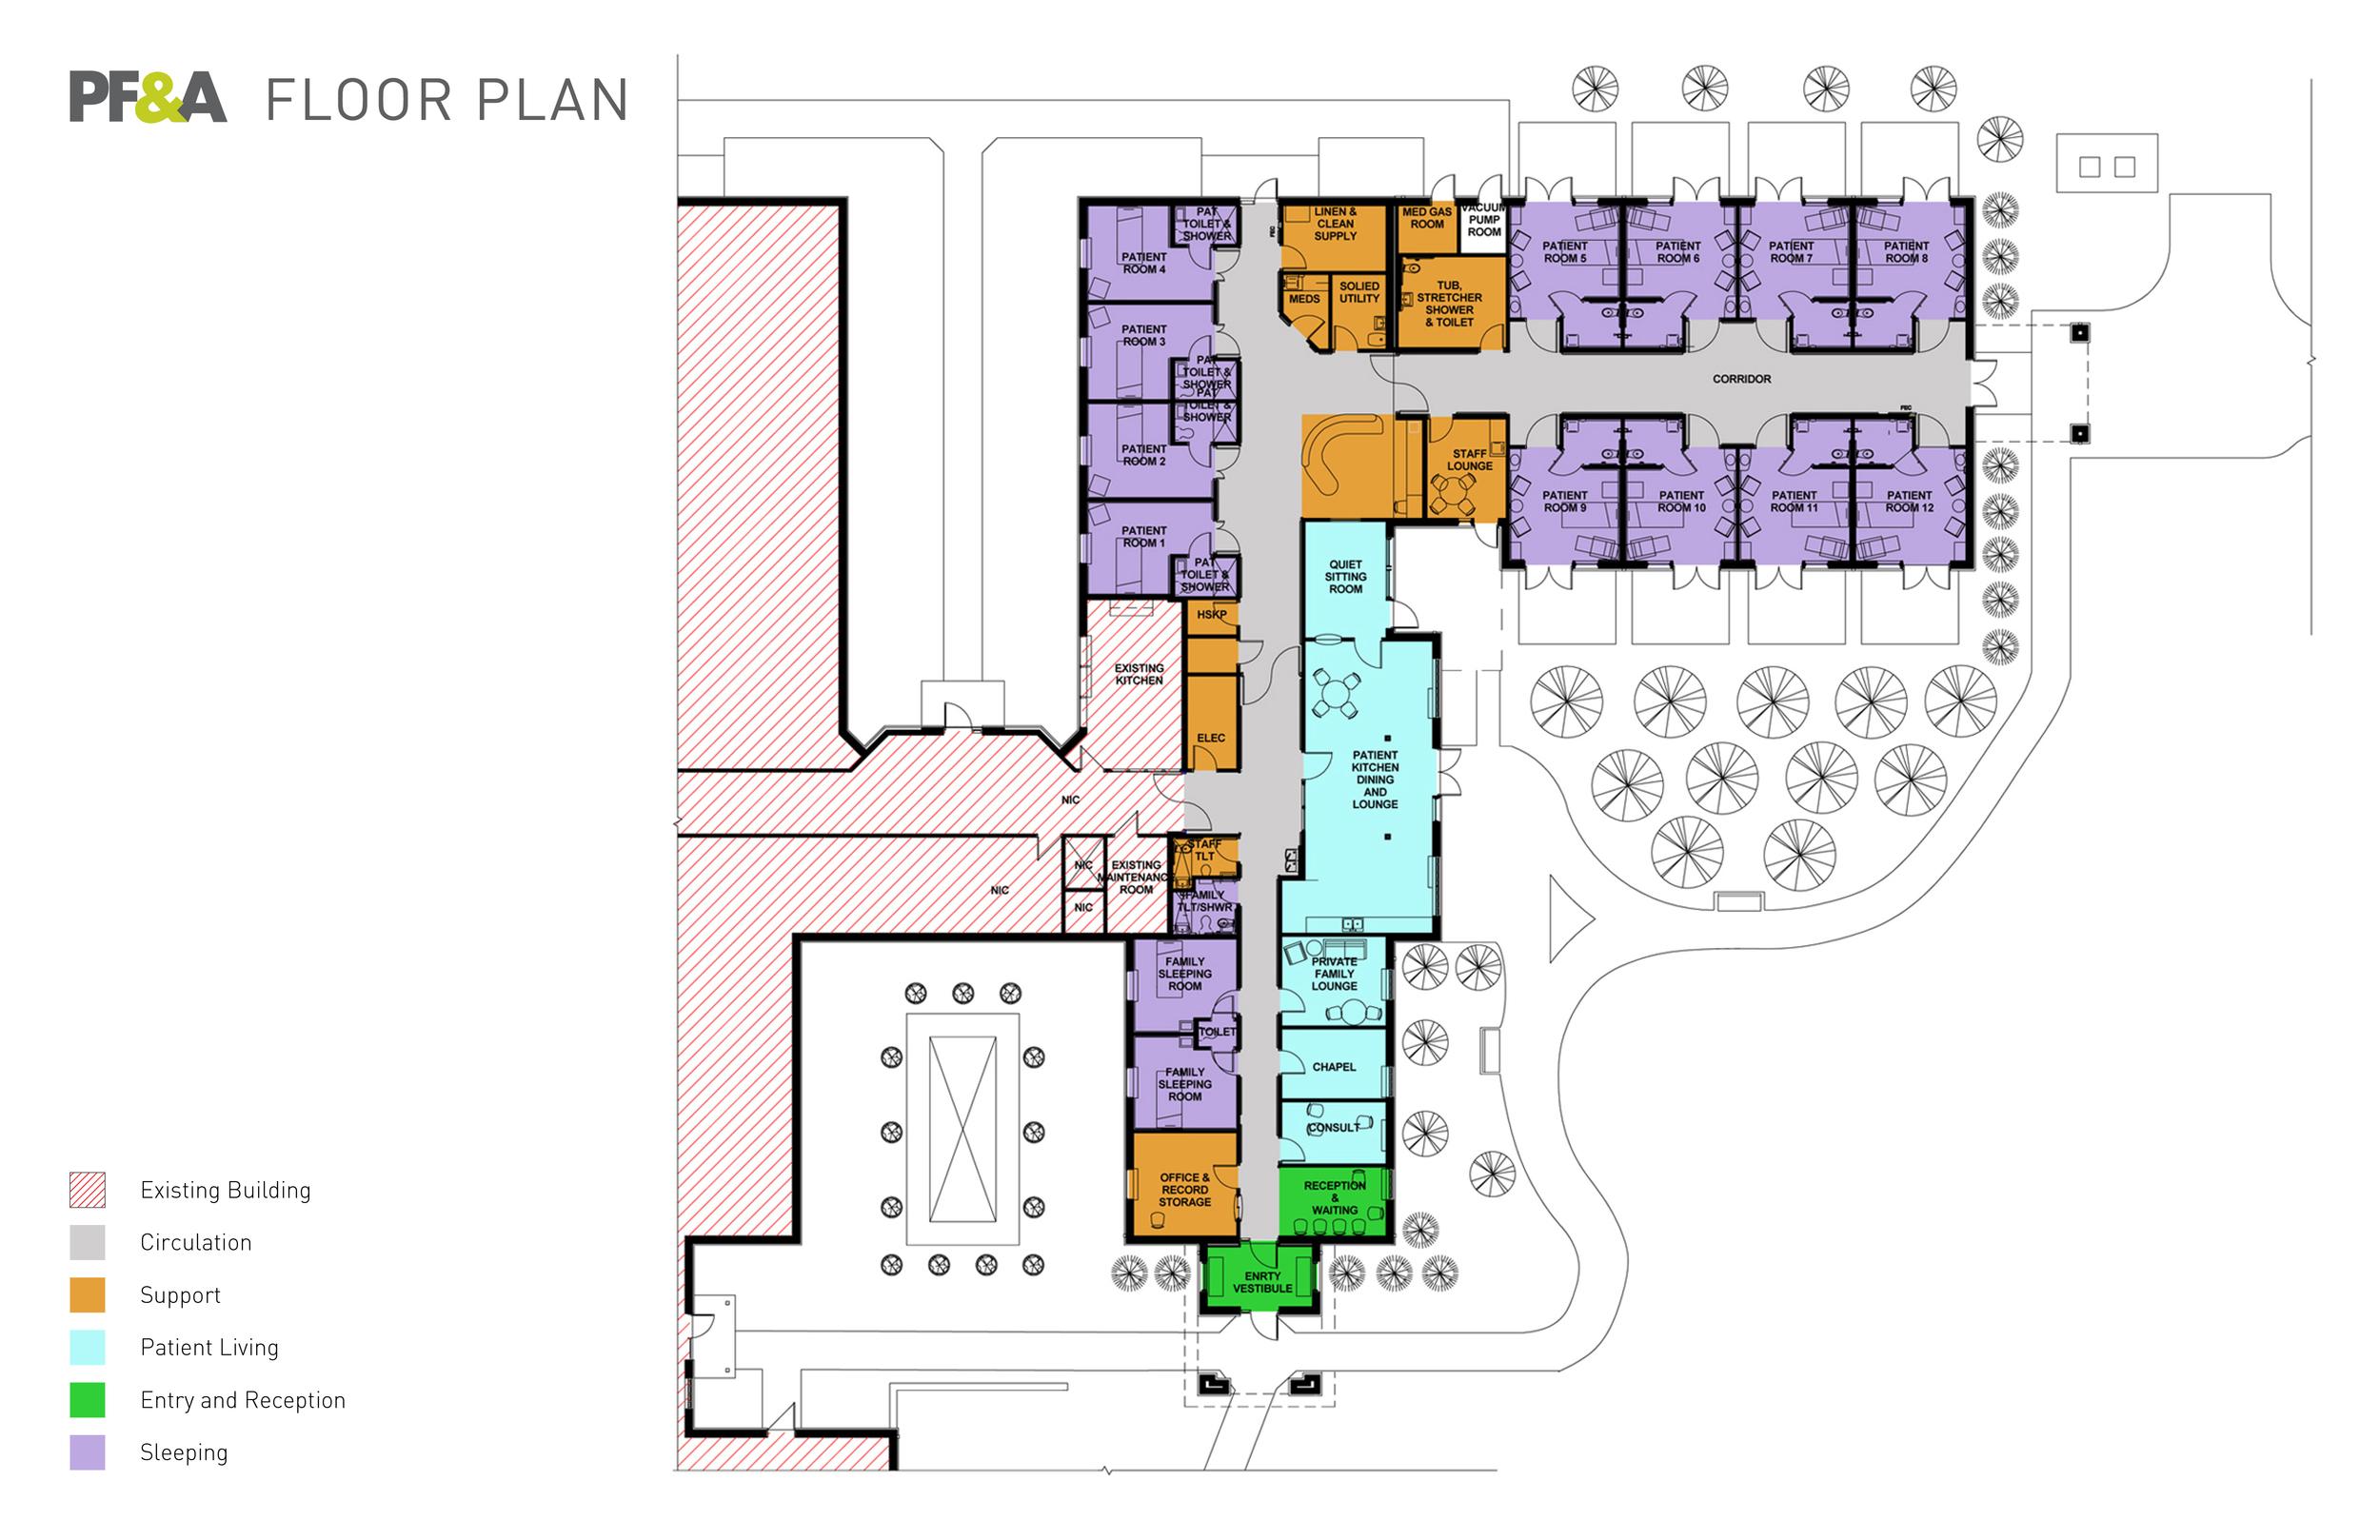 FloorPlan01a.jpg